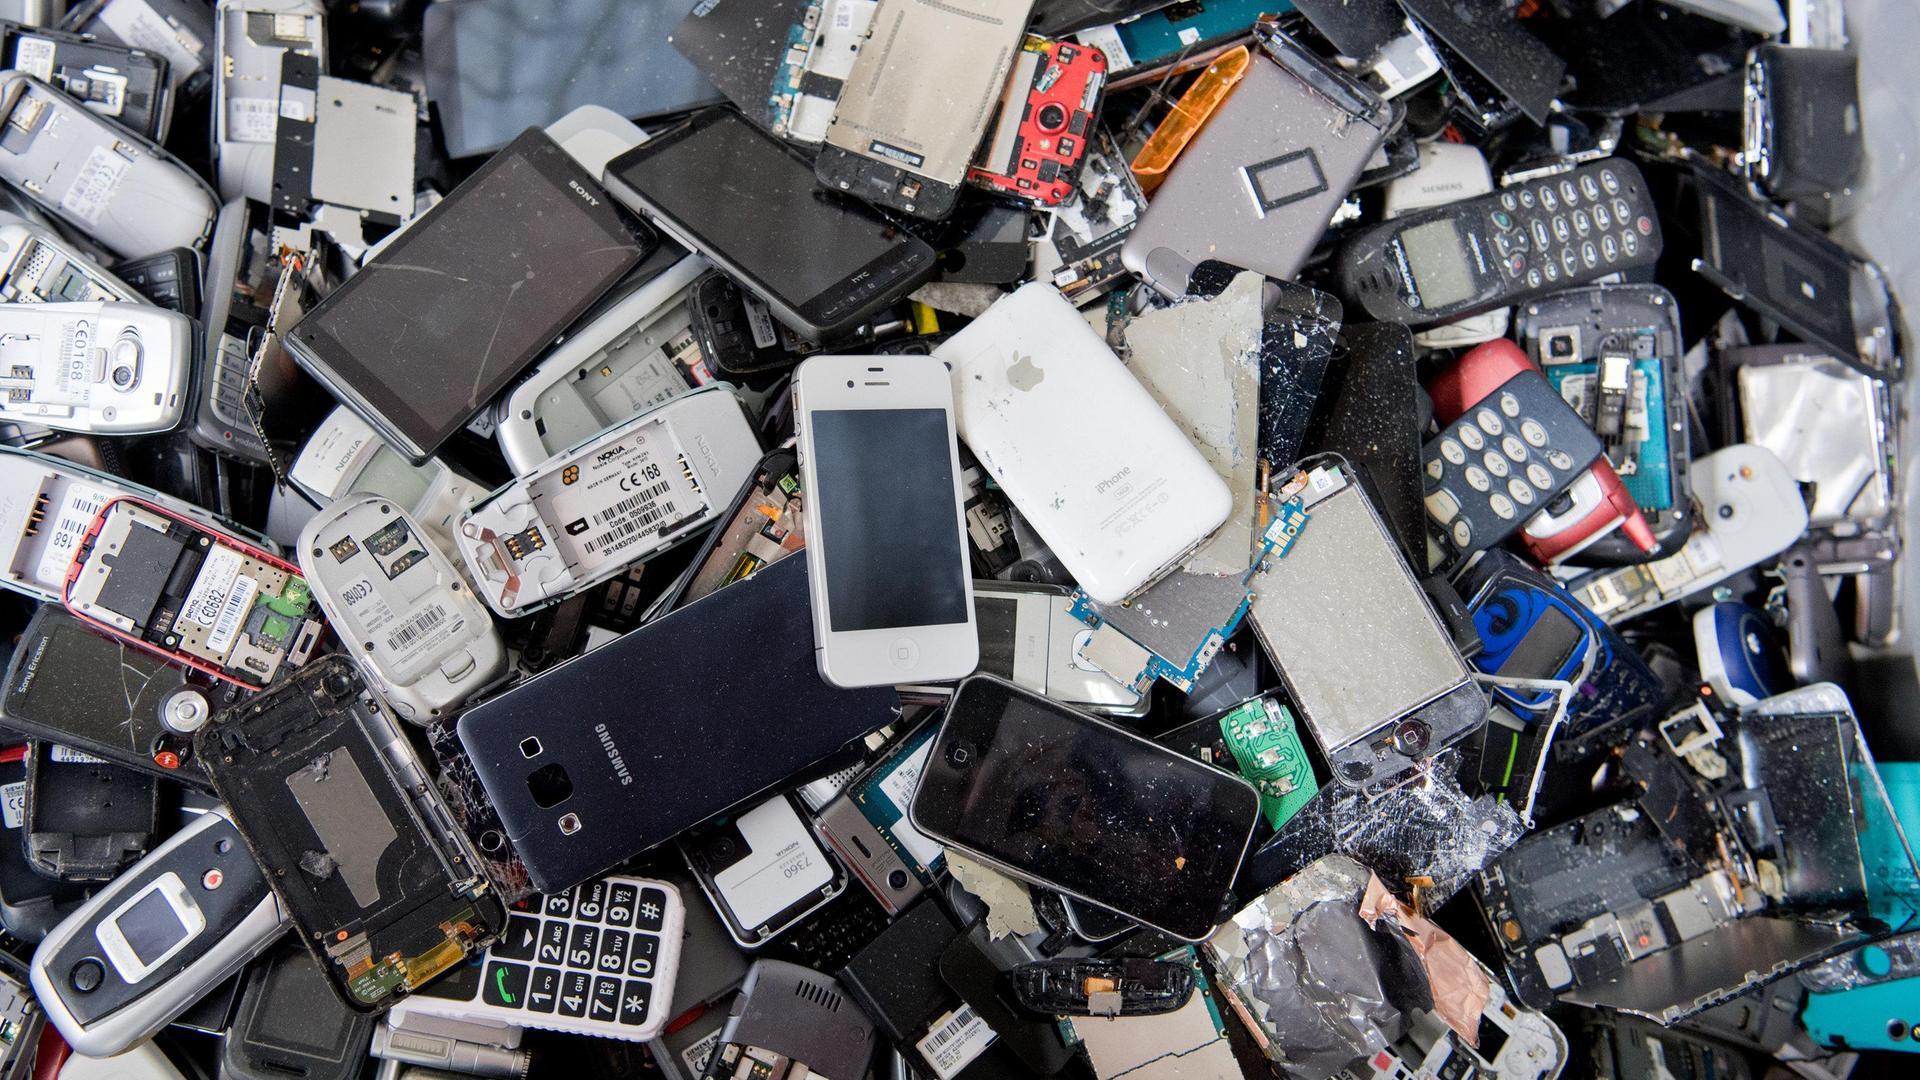 Logo Das Zweite Leben Unseres Elektromlls Zdfmediathek Electronics Scrap Recycling Pictures Zimbio Handys Richtig Entsorgen